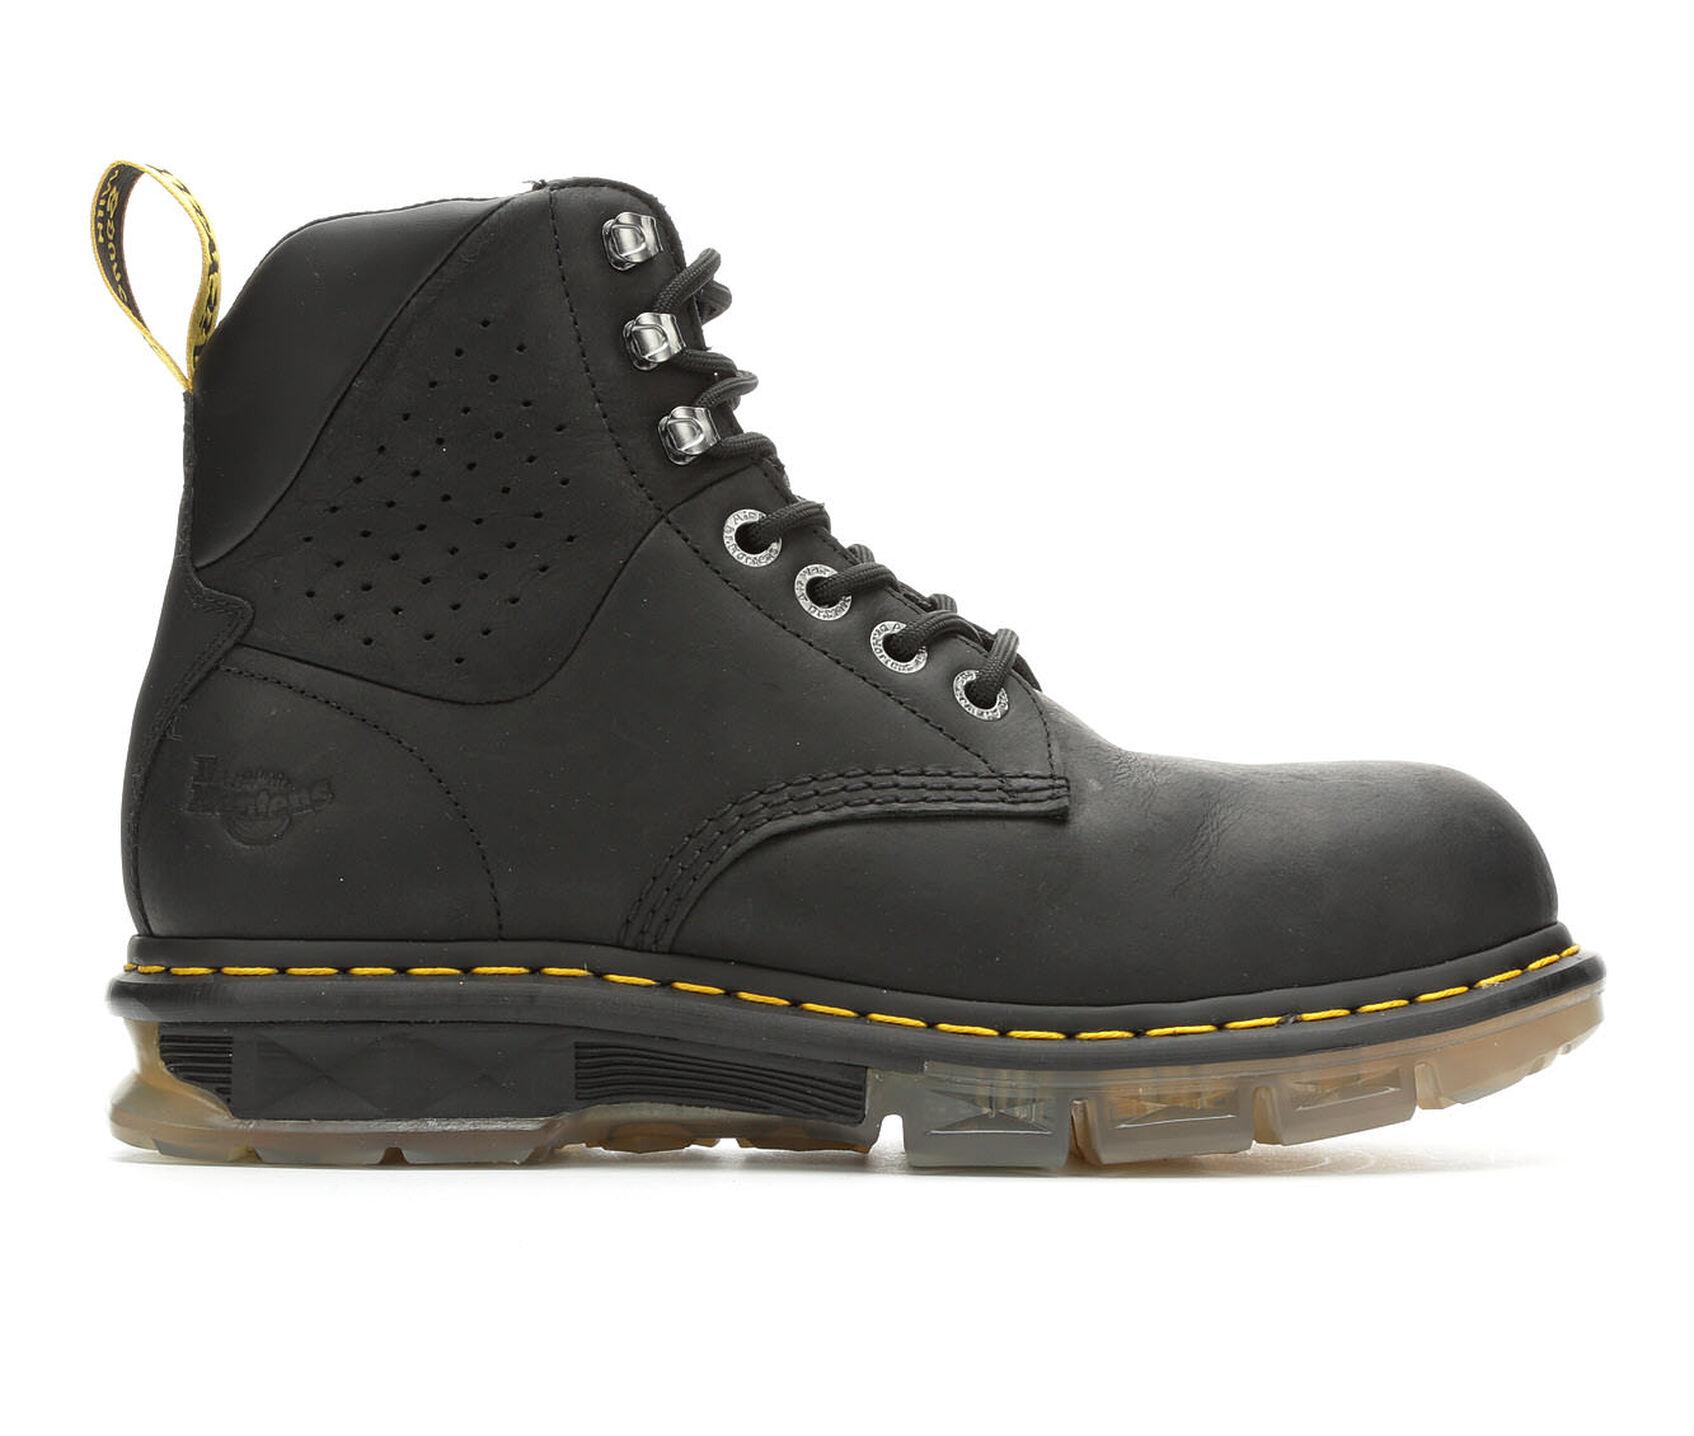 f68b390ad56 Men's Dr. Martens Industrial Britton Steel Toe Work Boots